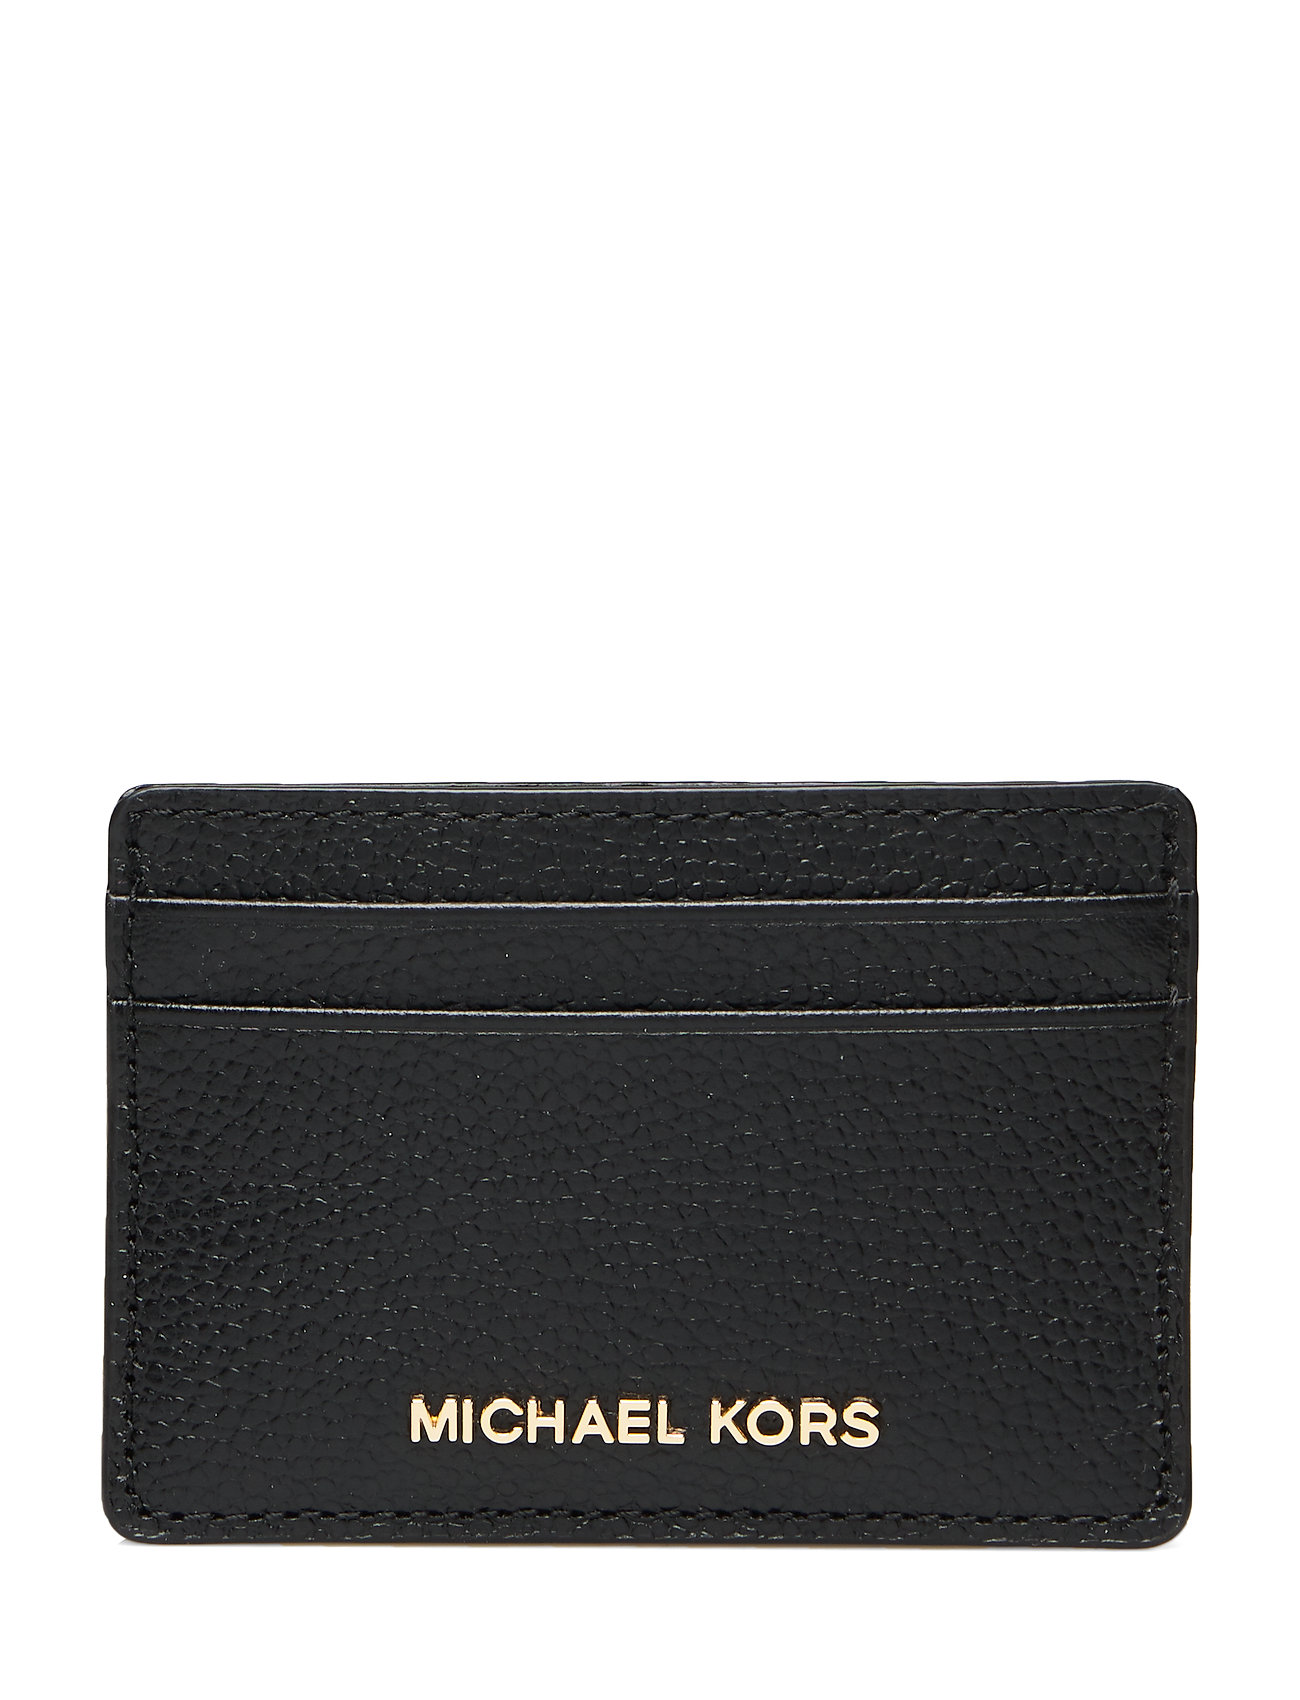 Michael Kors Bags CARD HOLDER - BLACK